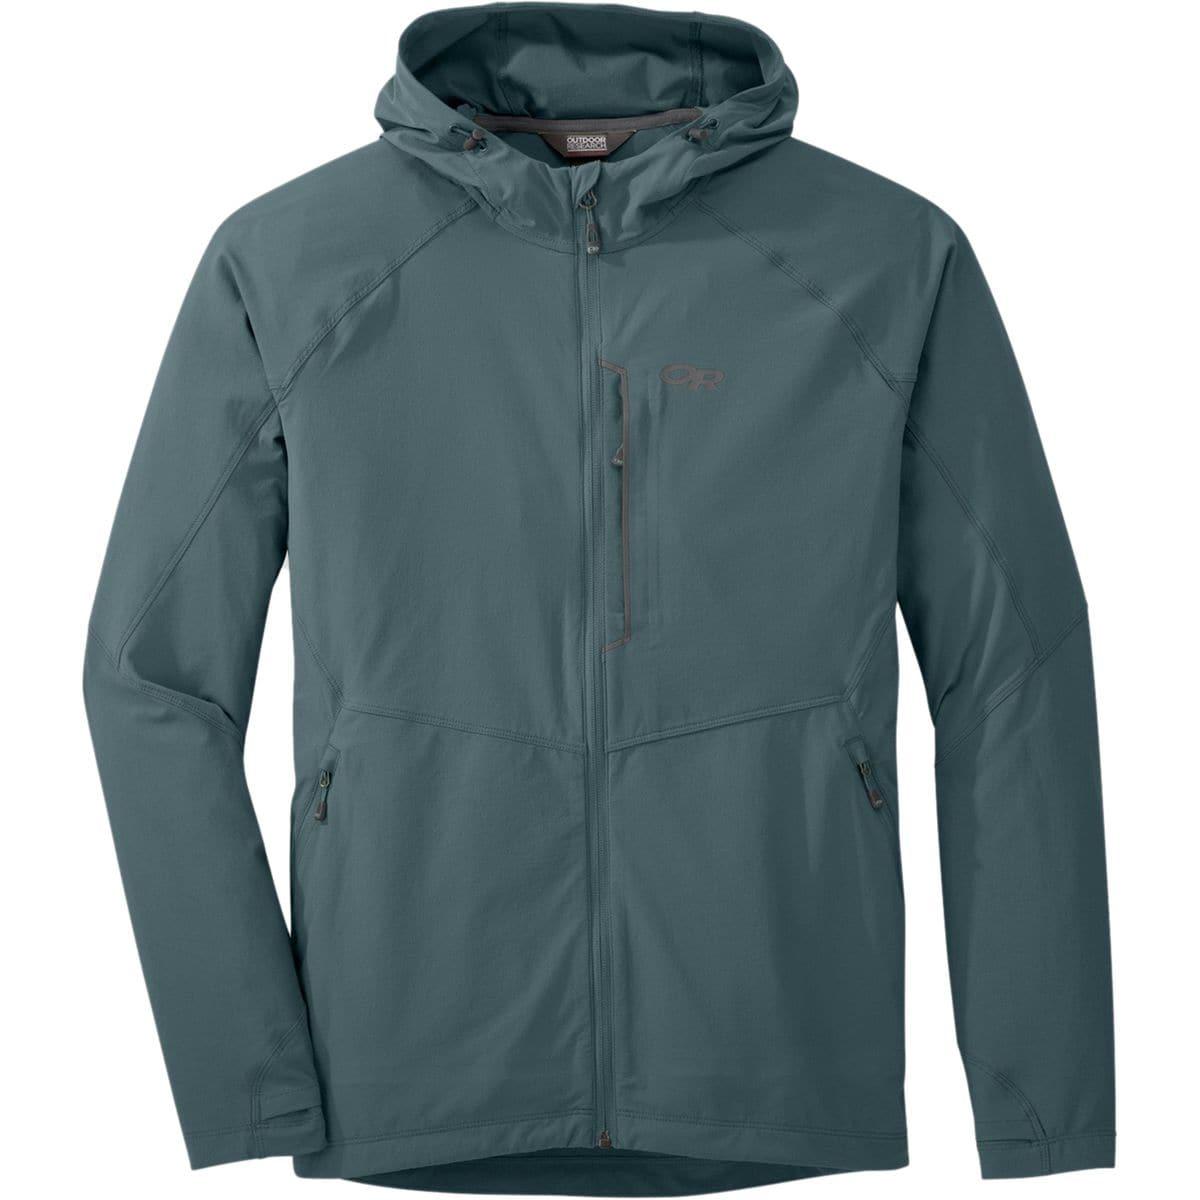 Outdoor Research Ferrosi Hooded Jacket - Men